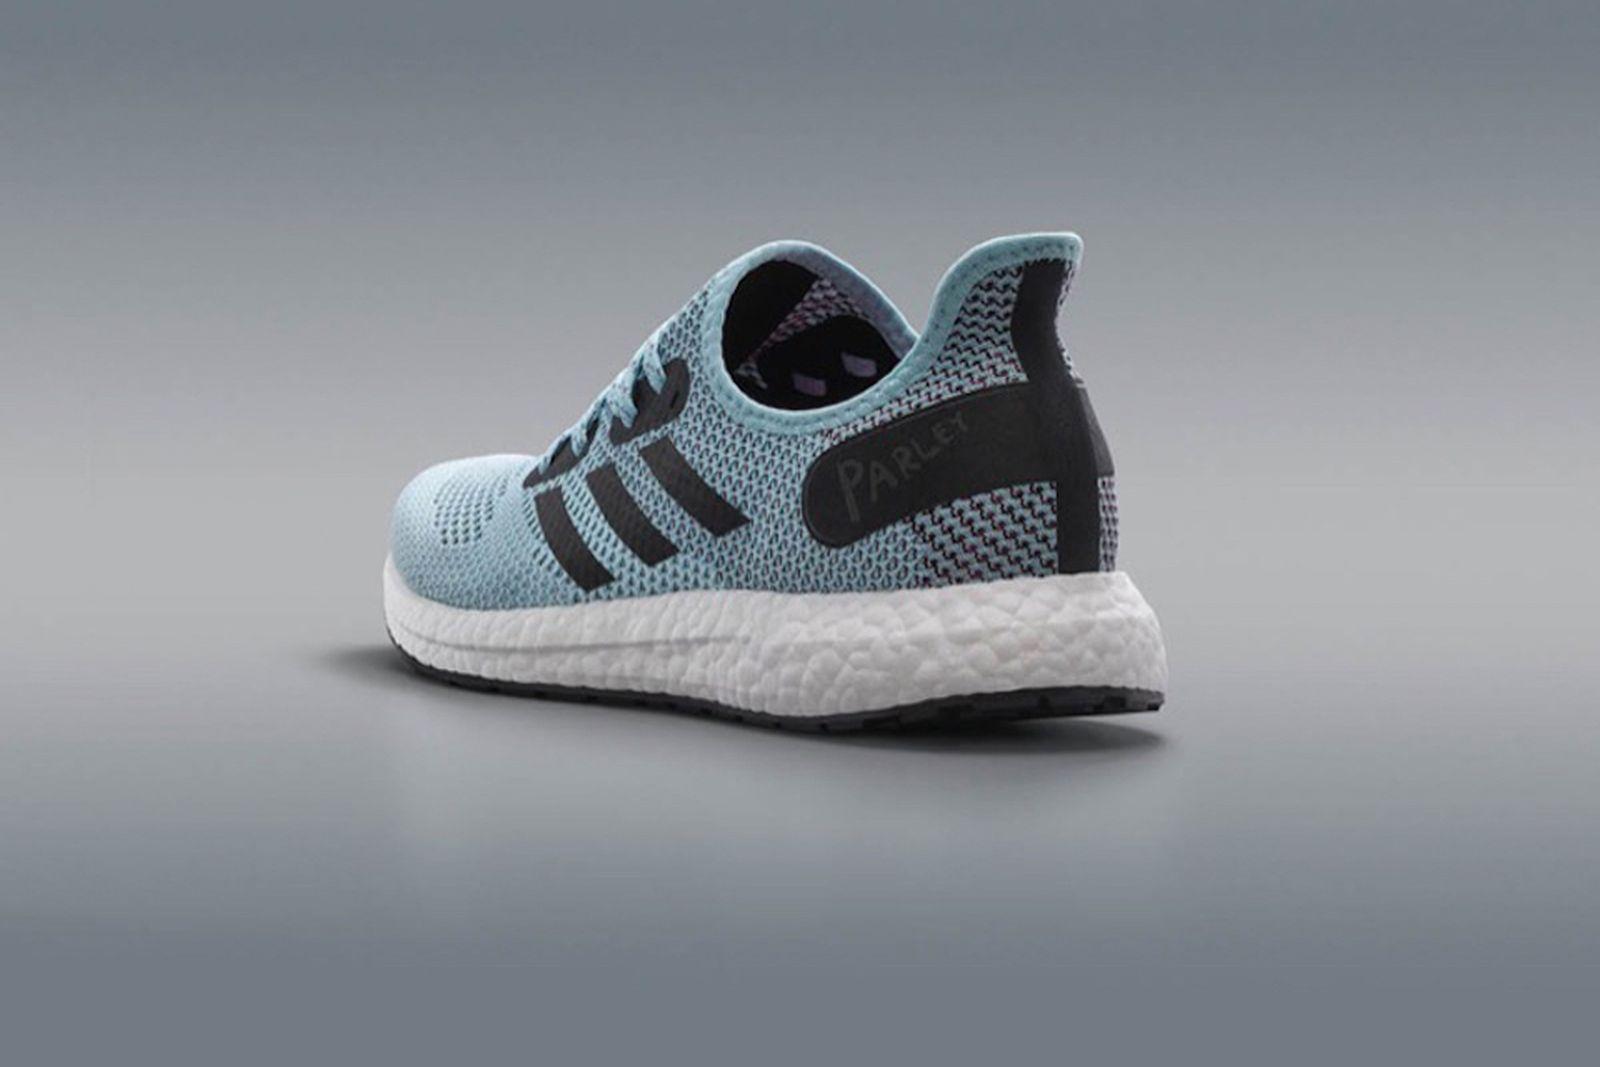 adidas-am4la-release-date-price-03